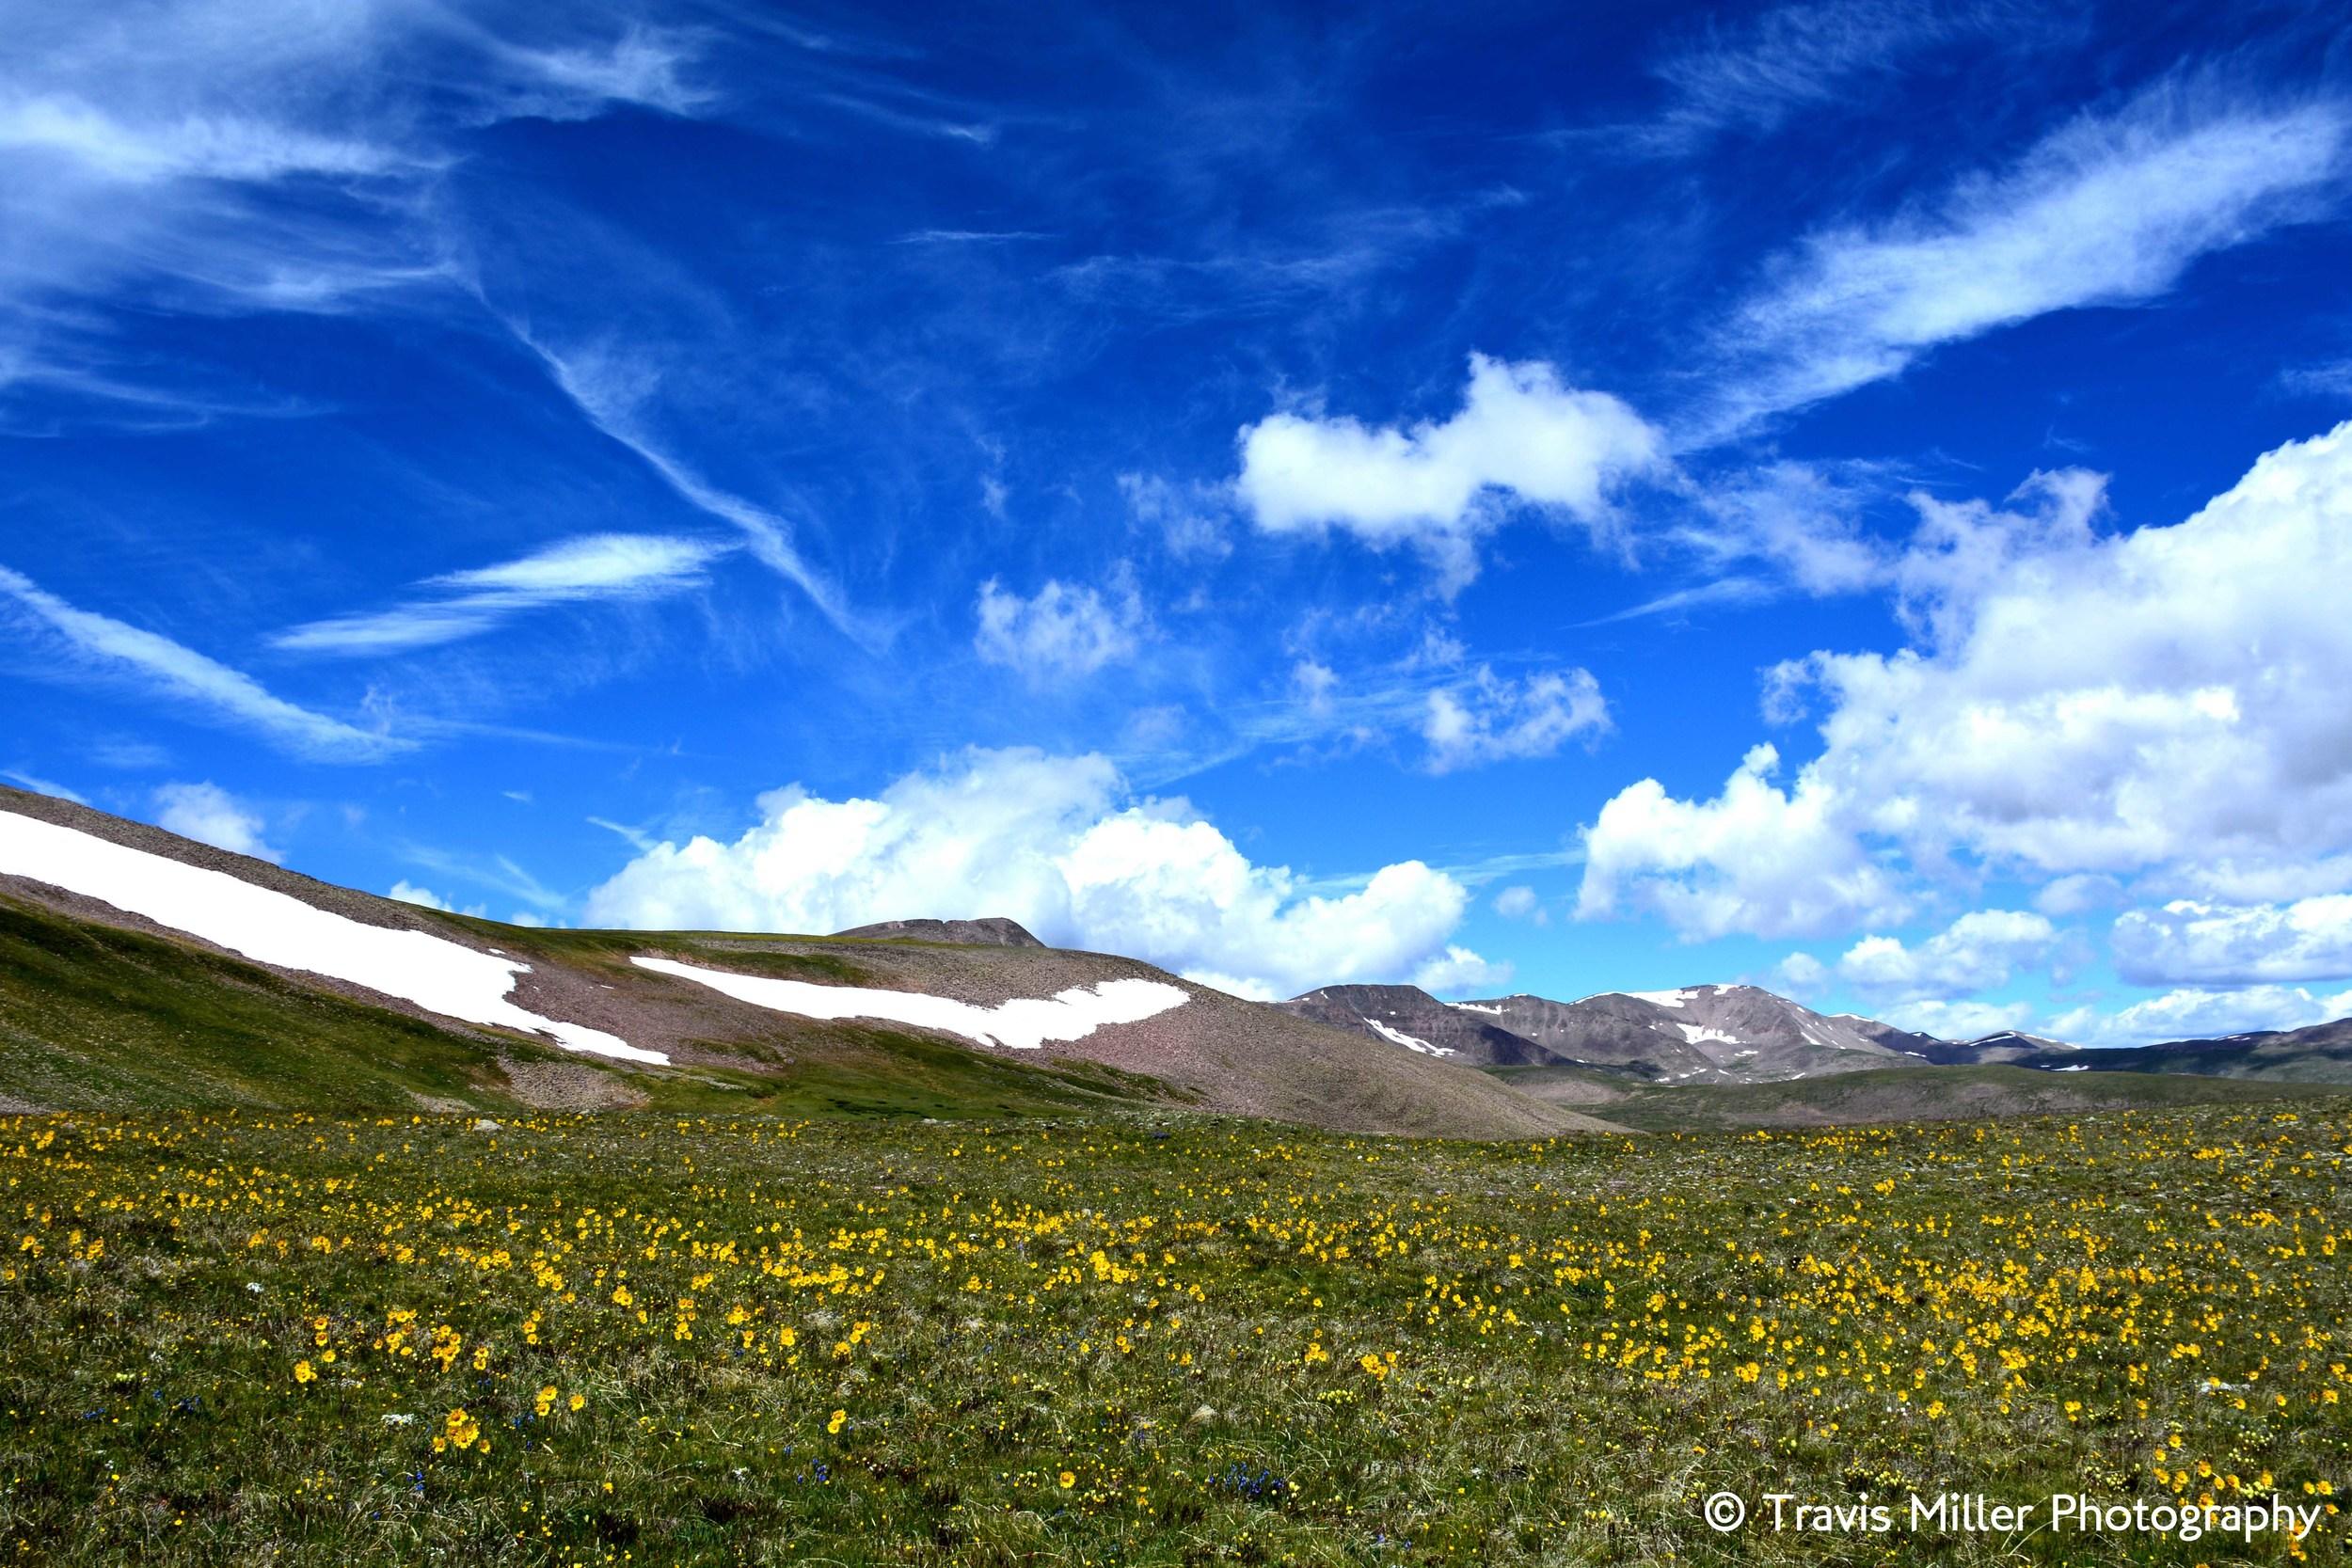 Summertime /  La Garita Wilderness Area, CO